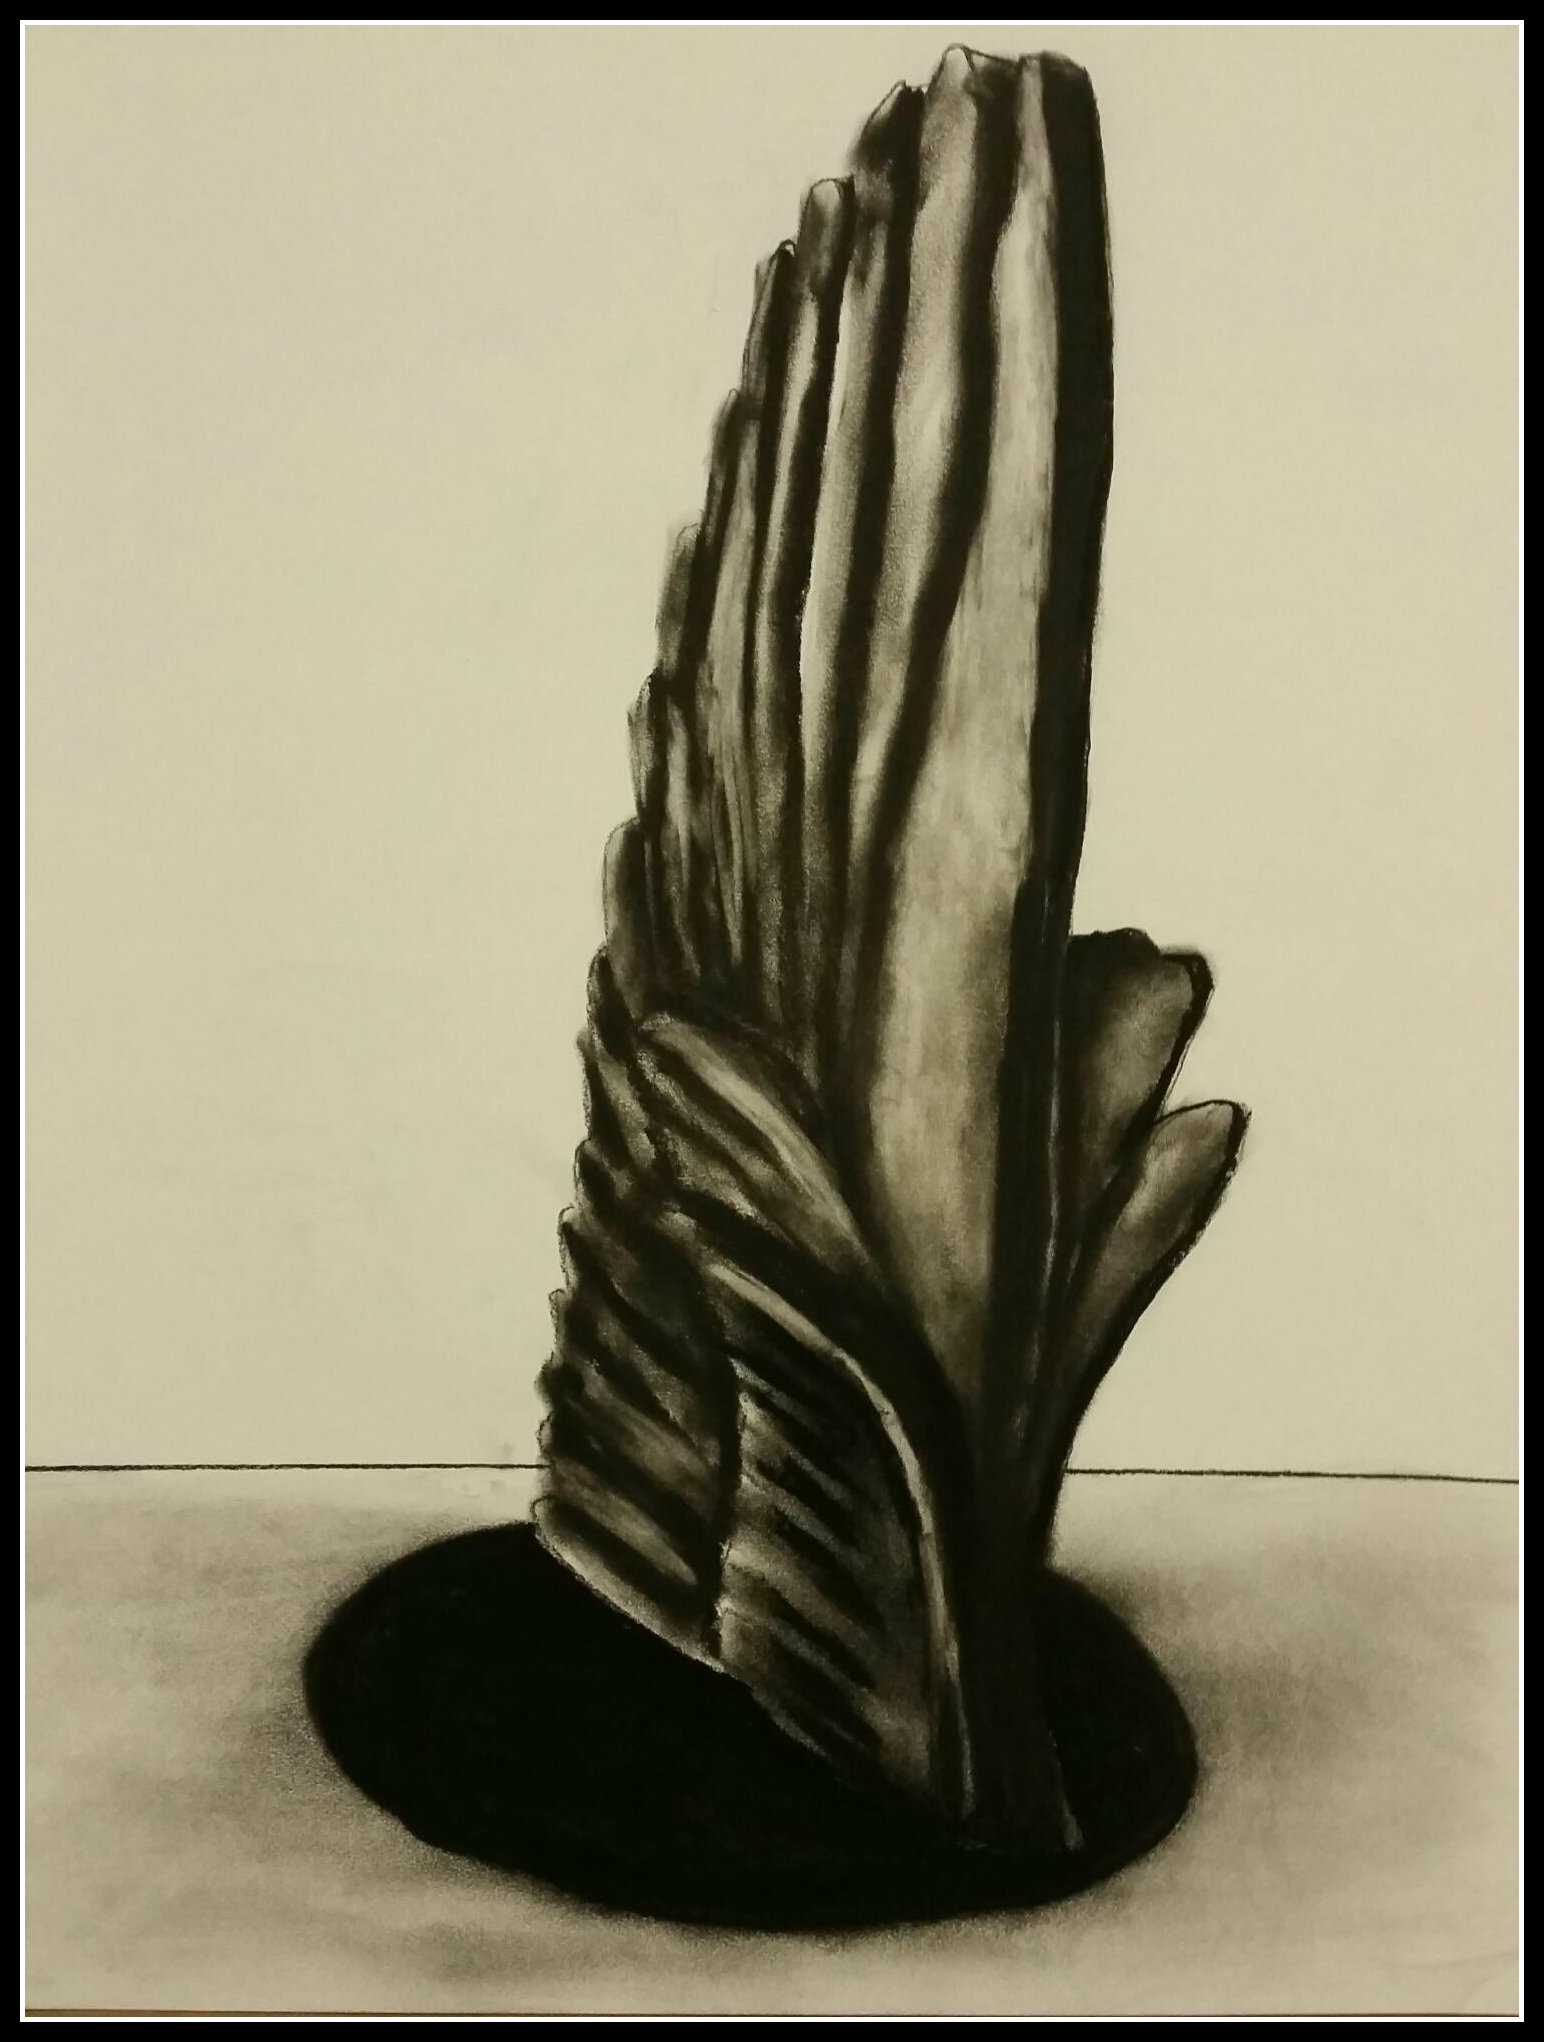 Da Vinci's Wing study